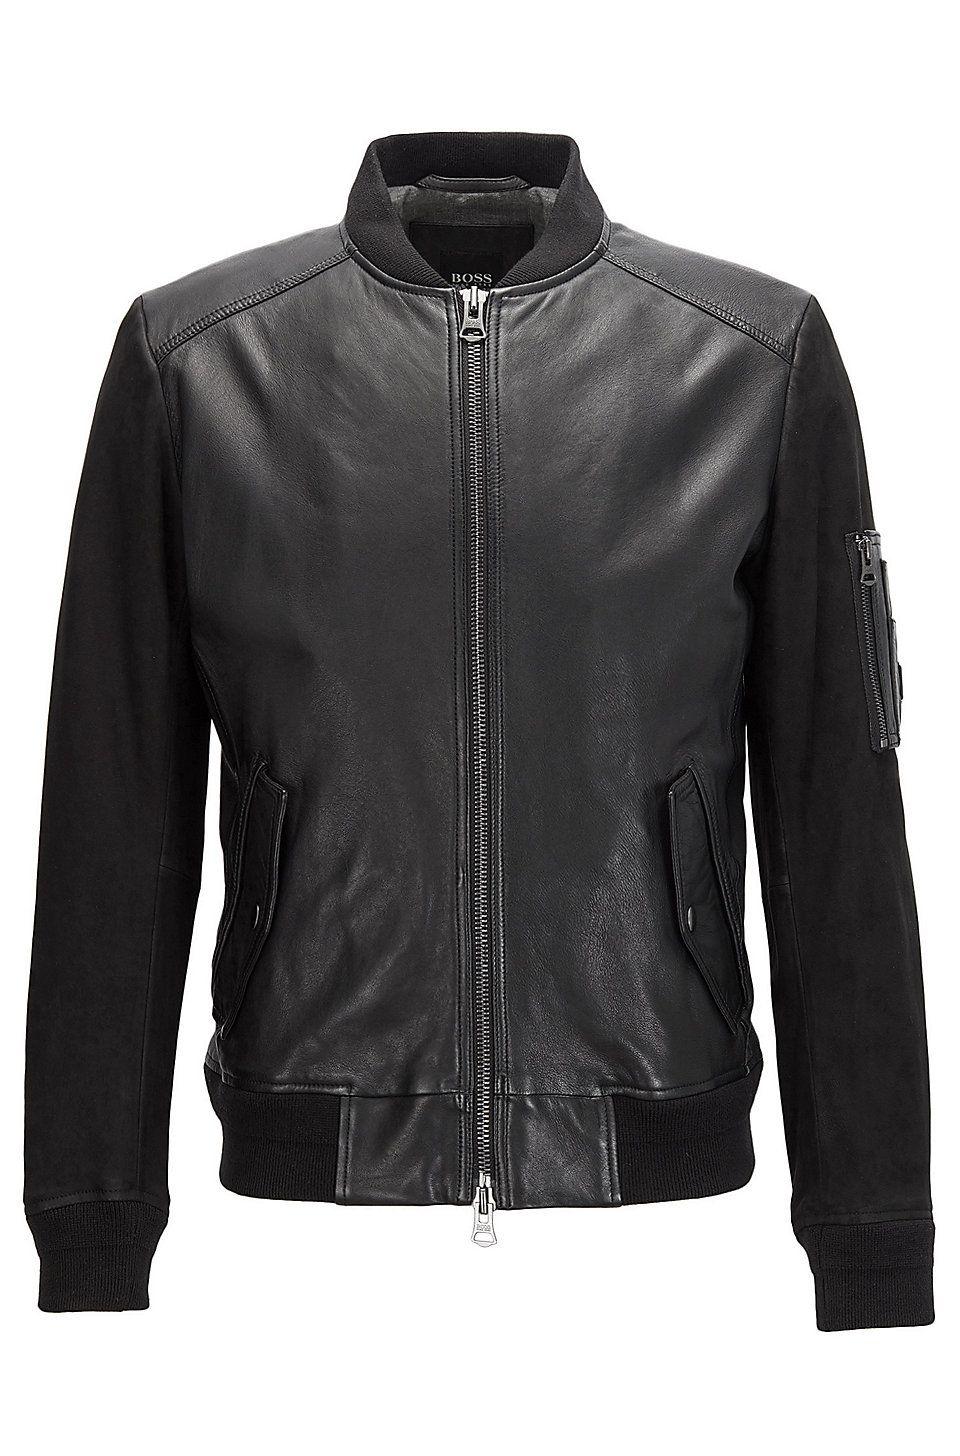 d0dd112c3 Sheepskin Leather Bomber Jacket | Jixx Black from BOSS Orange for Men for  $645.00 in the official HUGO BOSS Online Store free shipping